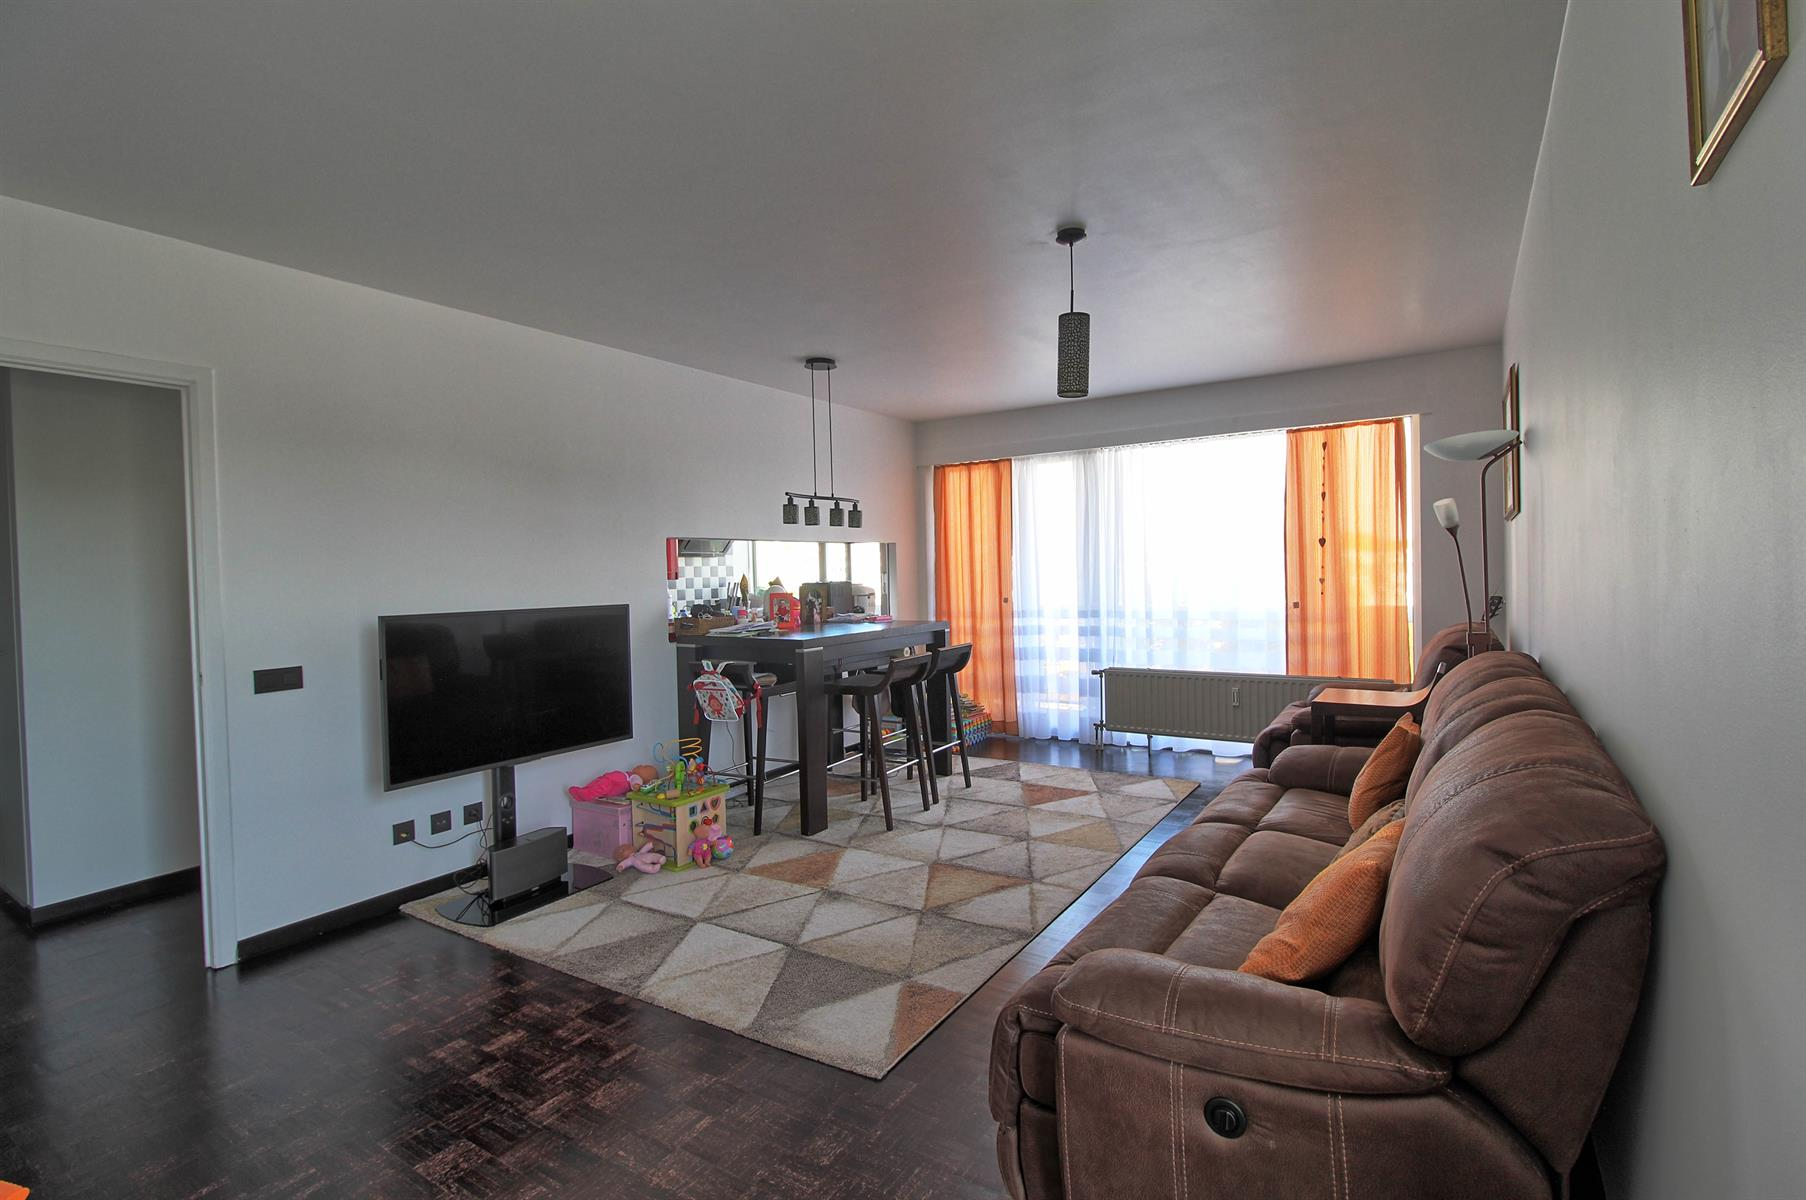 Appartement - Woluwe-Saint-Lambert - #4207409-0